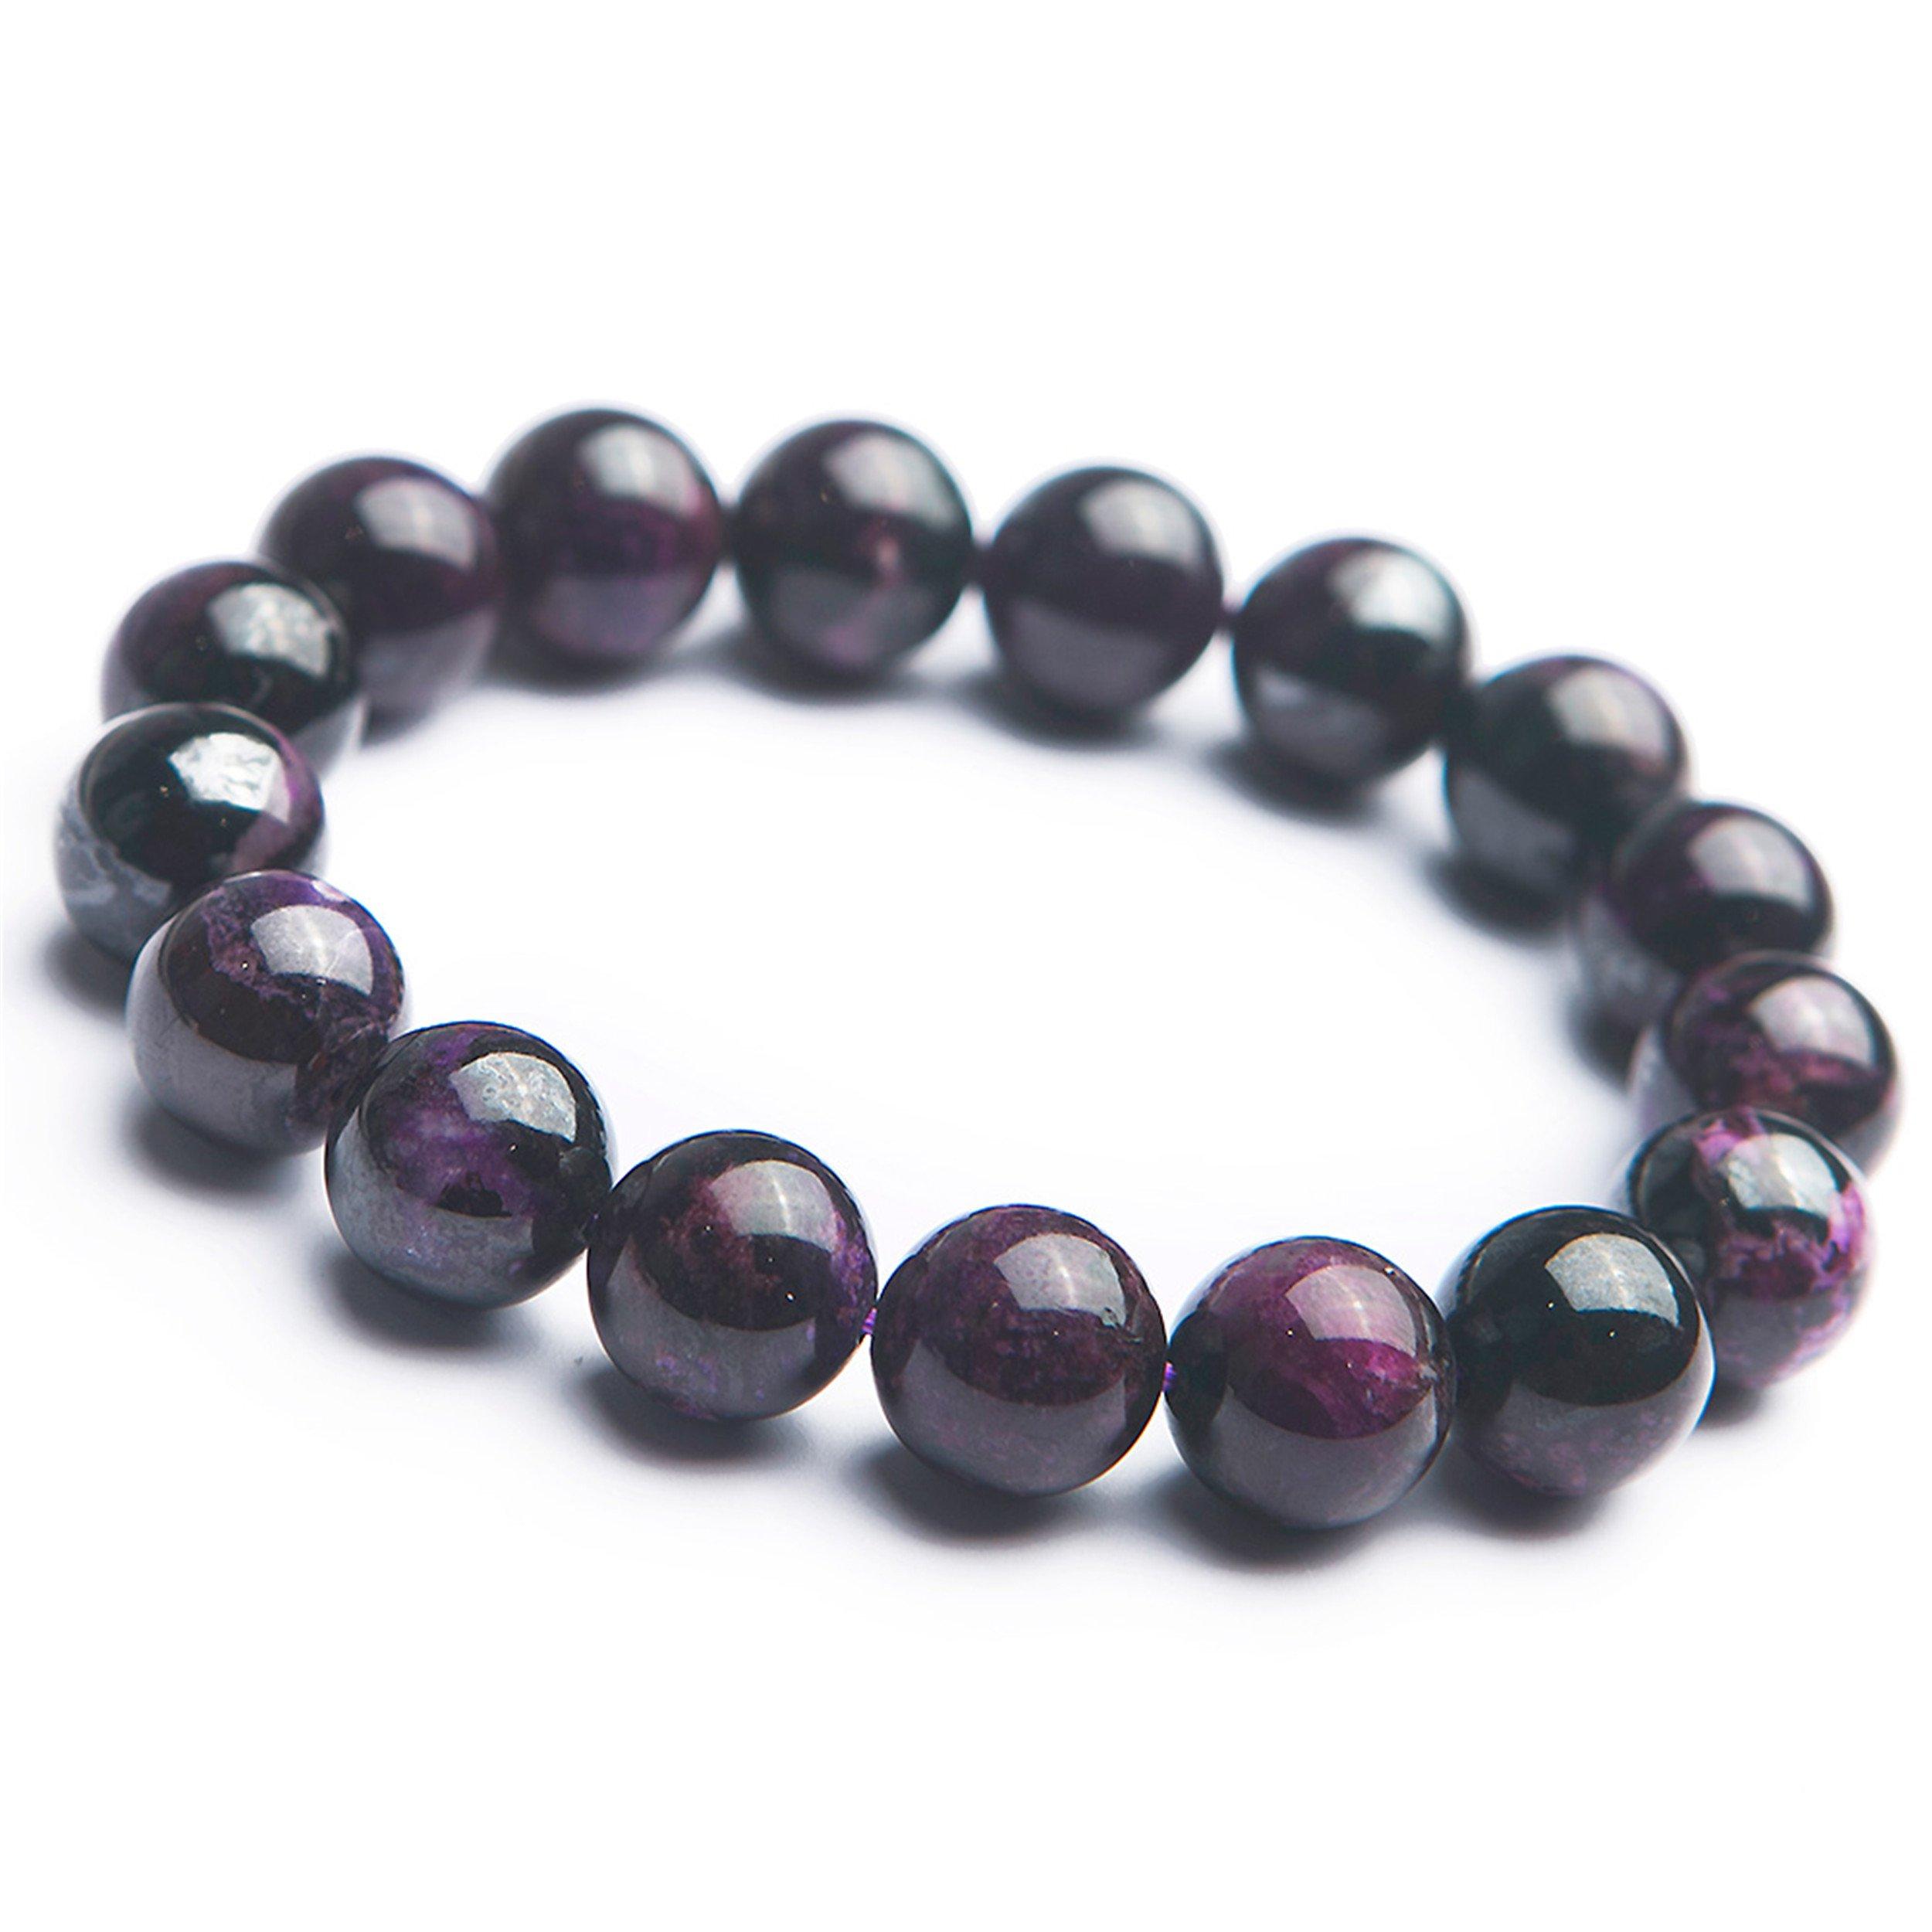 12.5mm Purple Natural Sugilite Gemstone Round Crystal Bead Stretch Bracelet